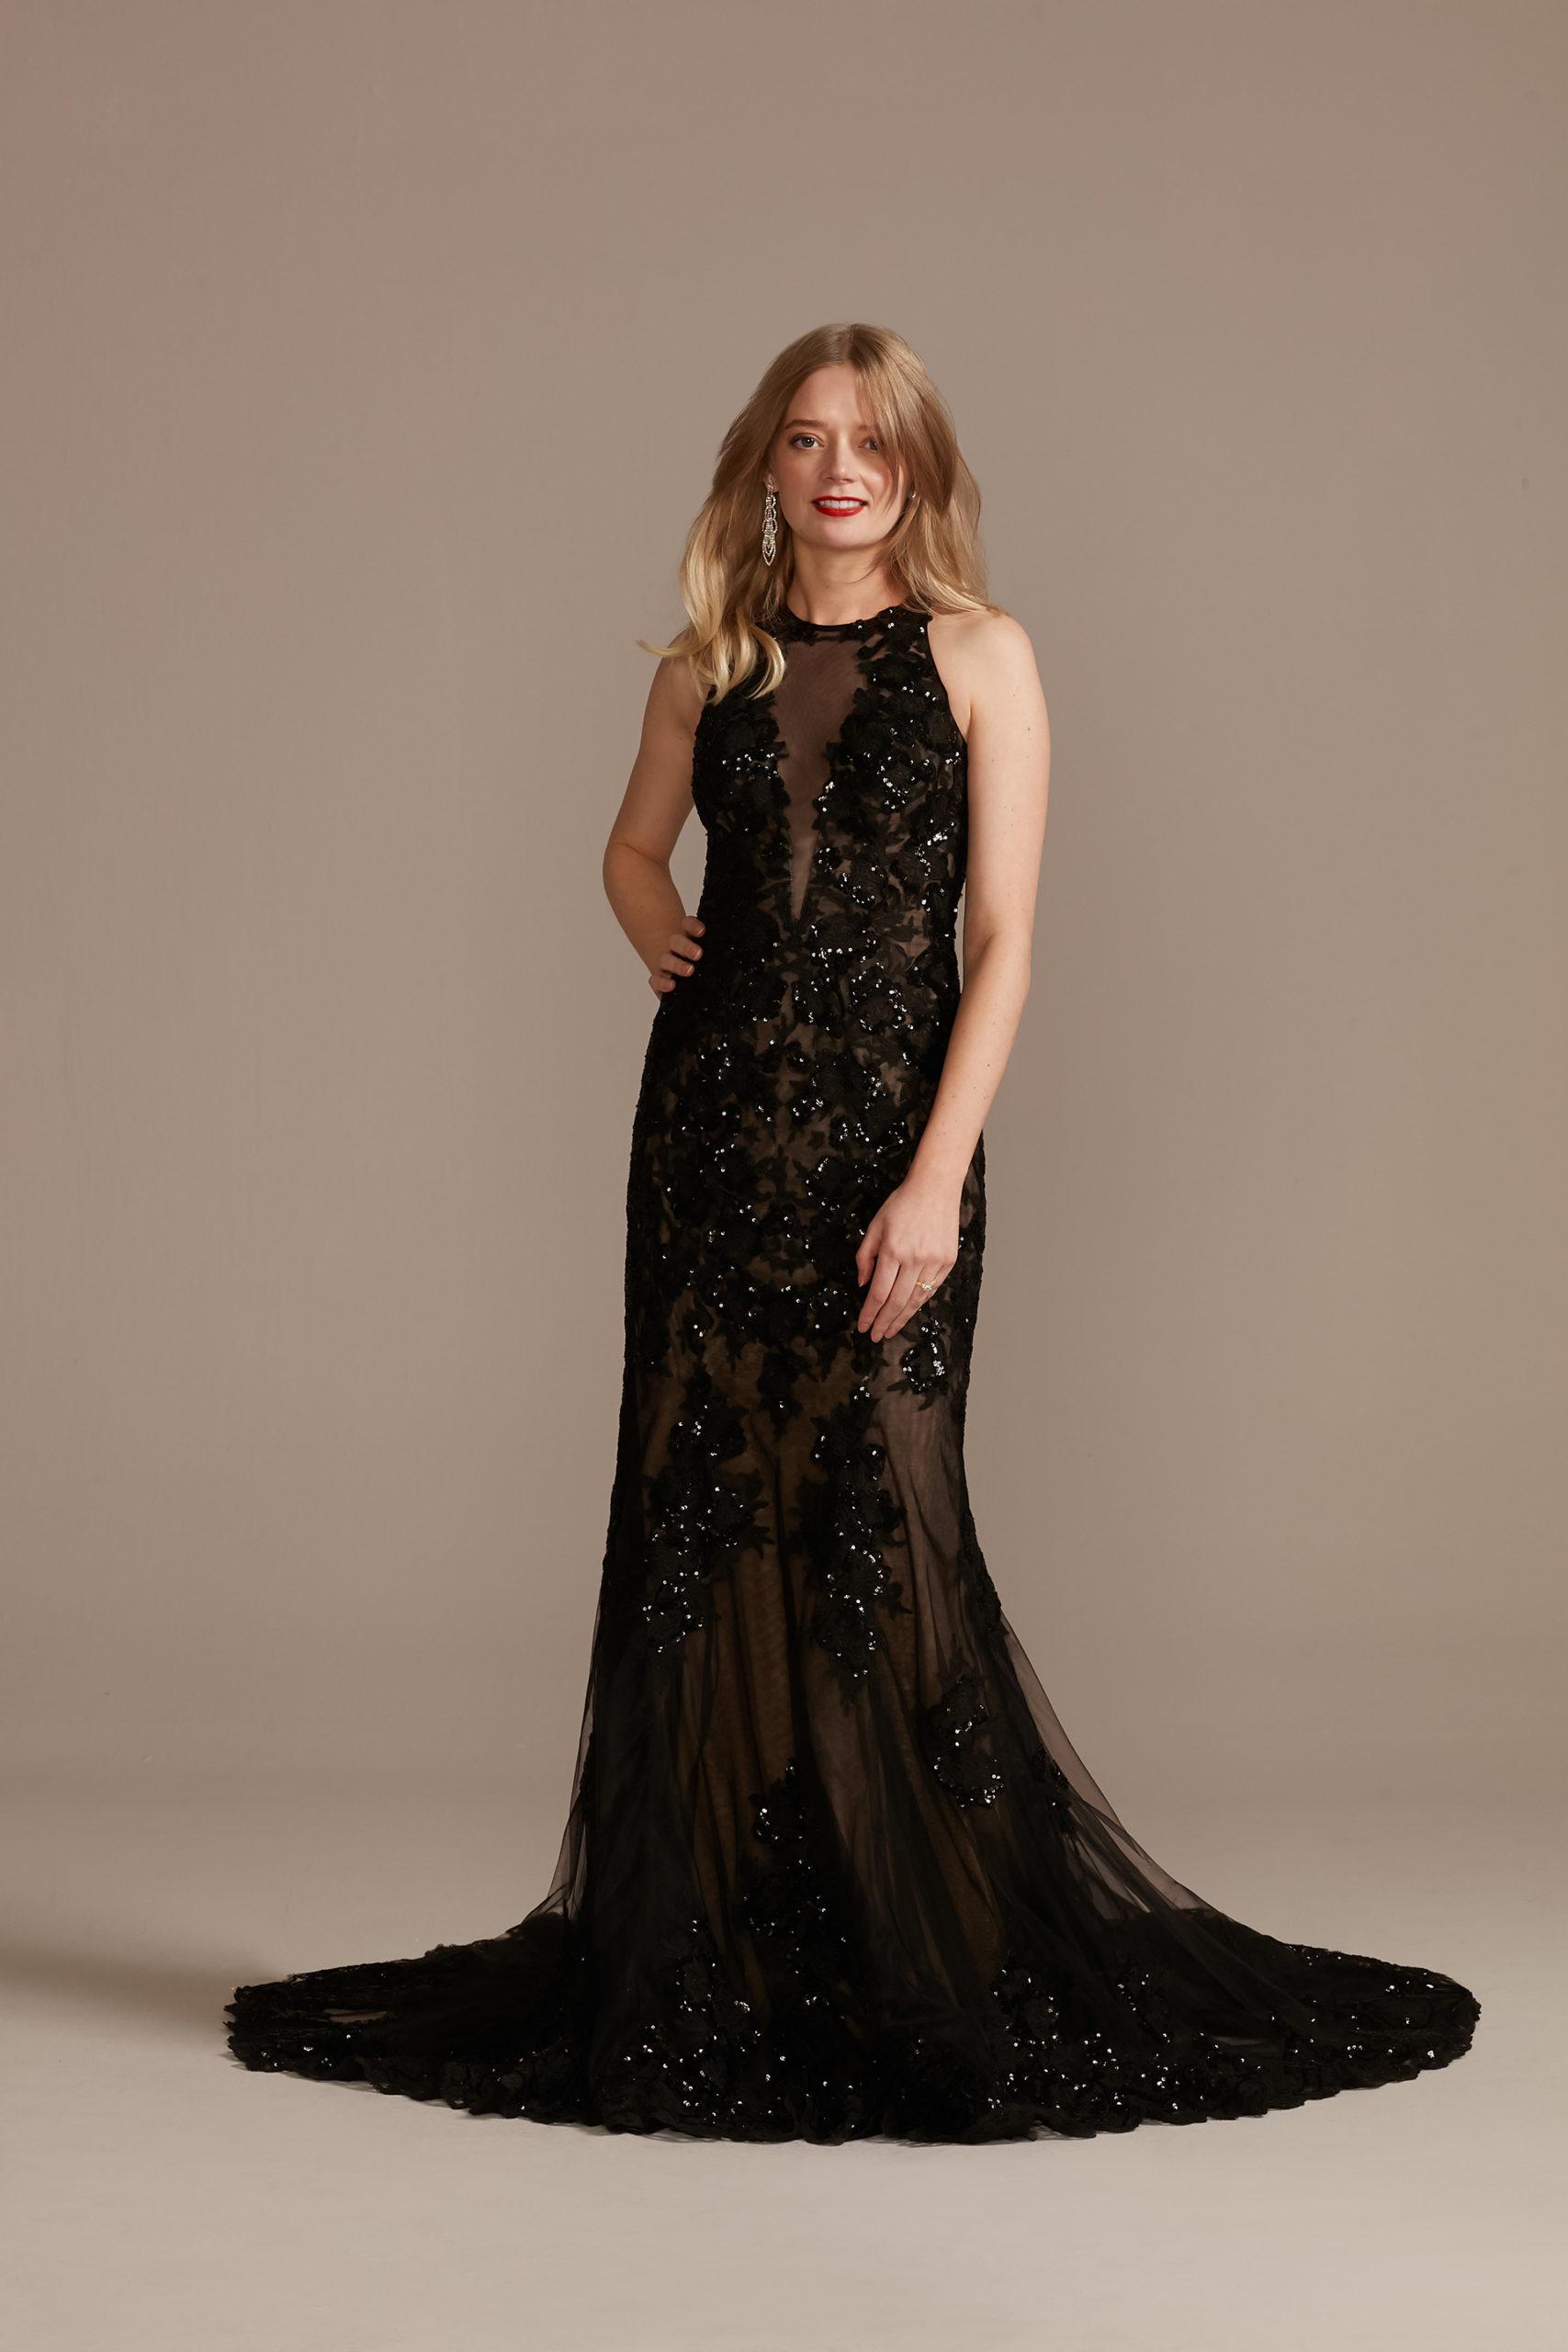 unconventional black mermaid wedding dress